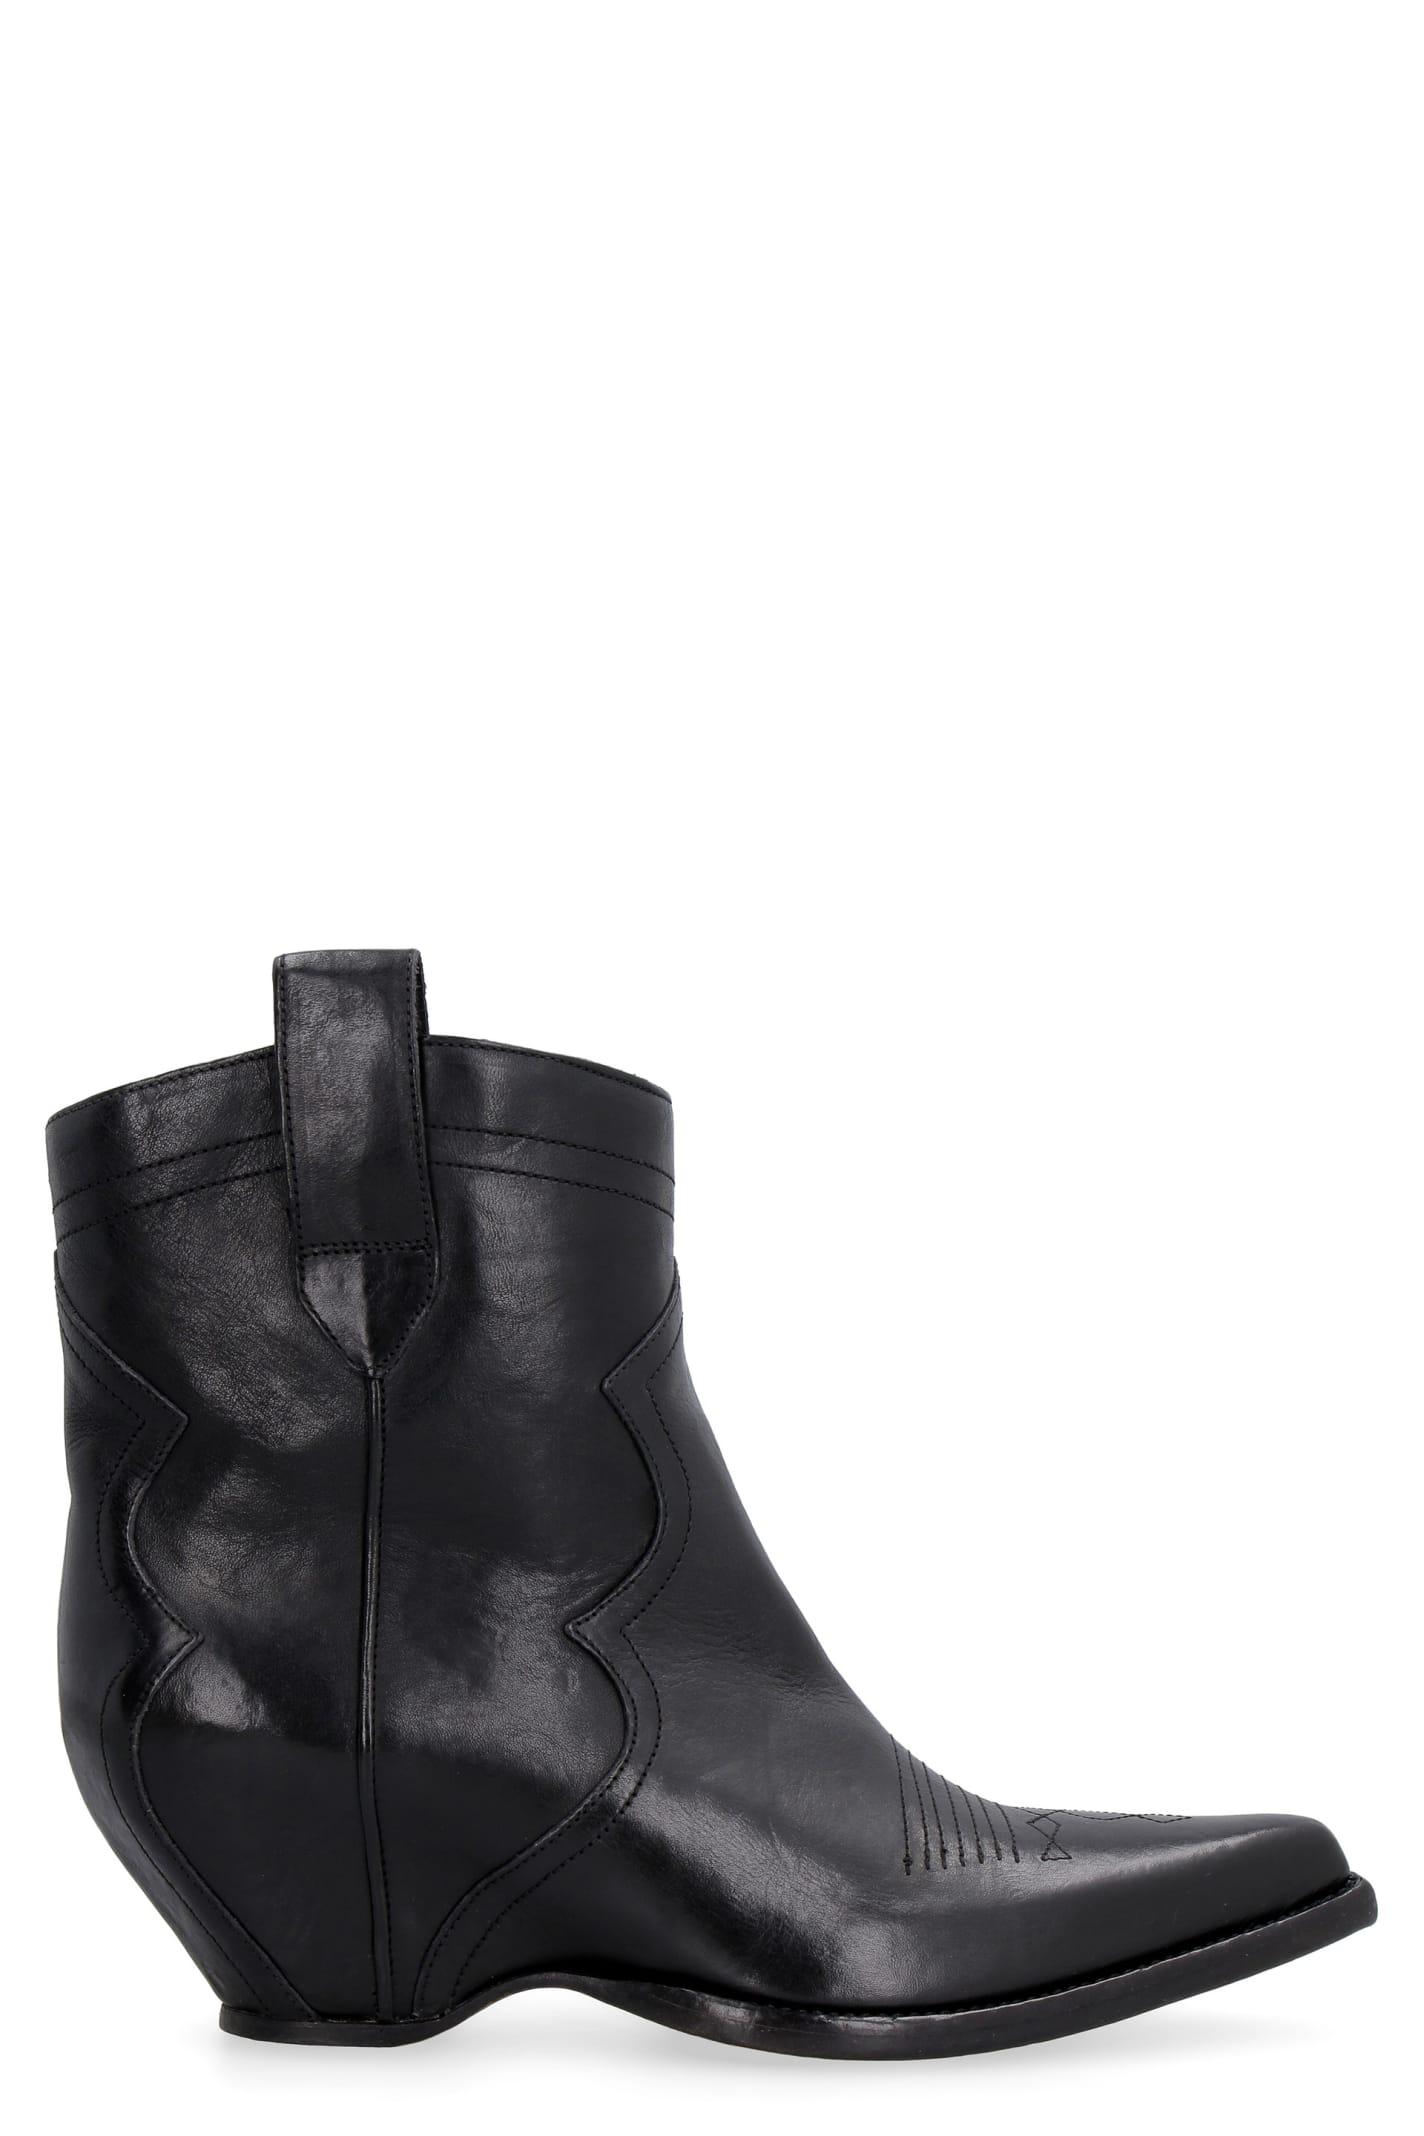 Buy Maison Margiela Pointy-toe Cowboy Boots online, shop Maison Margiela shoes with free shipping